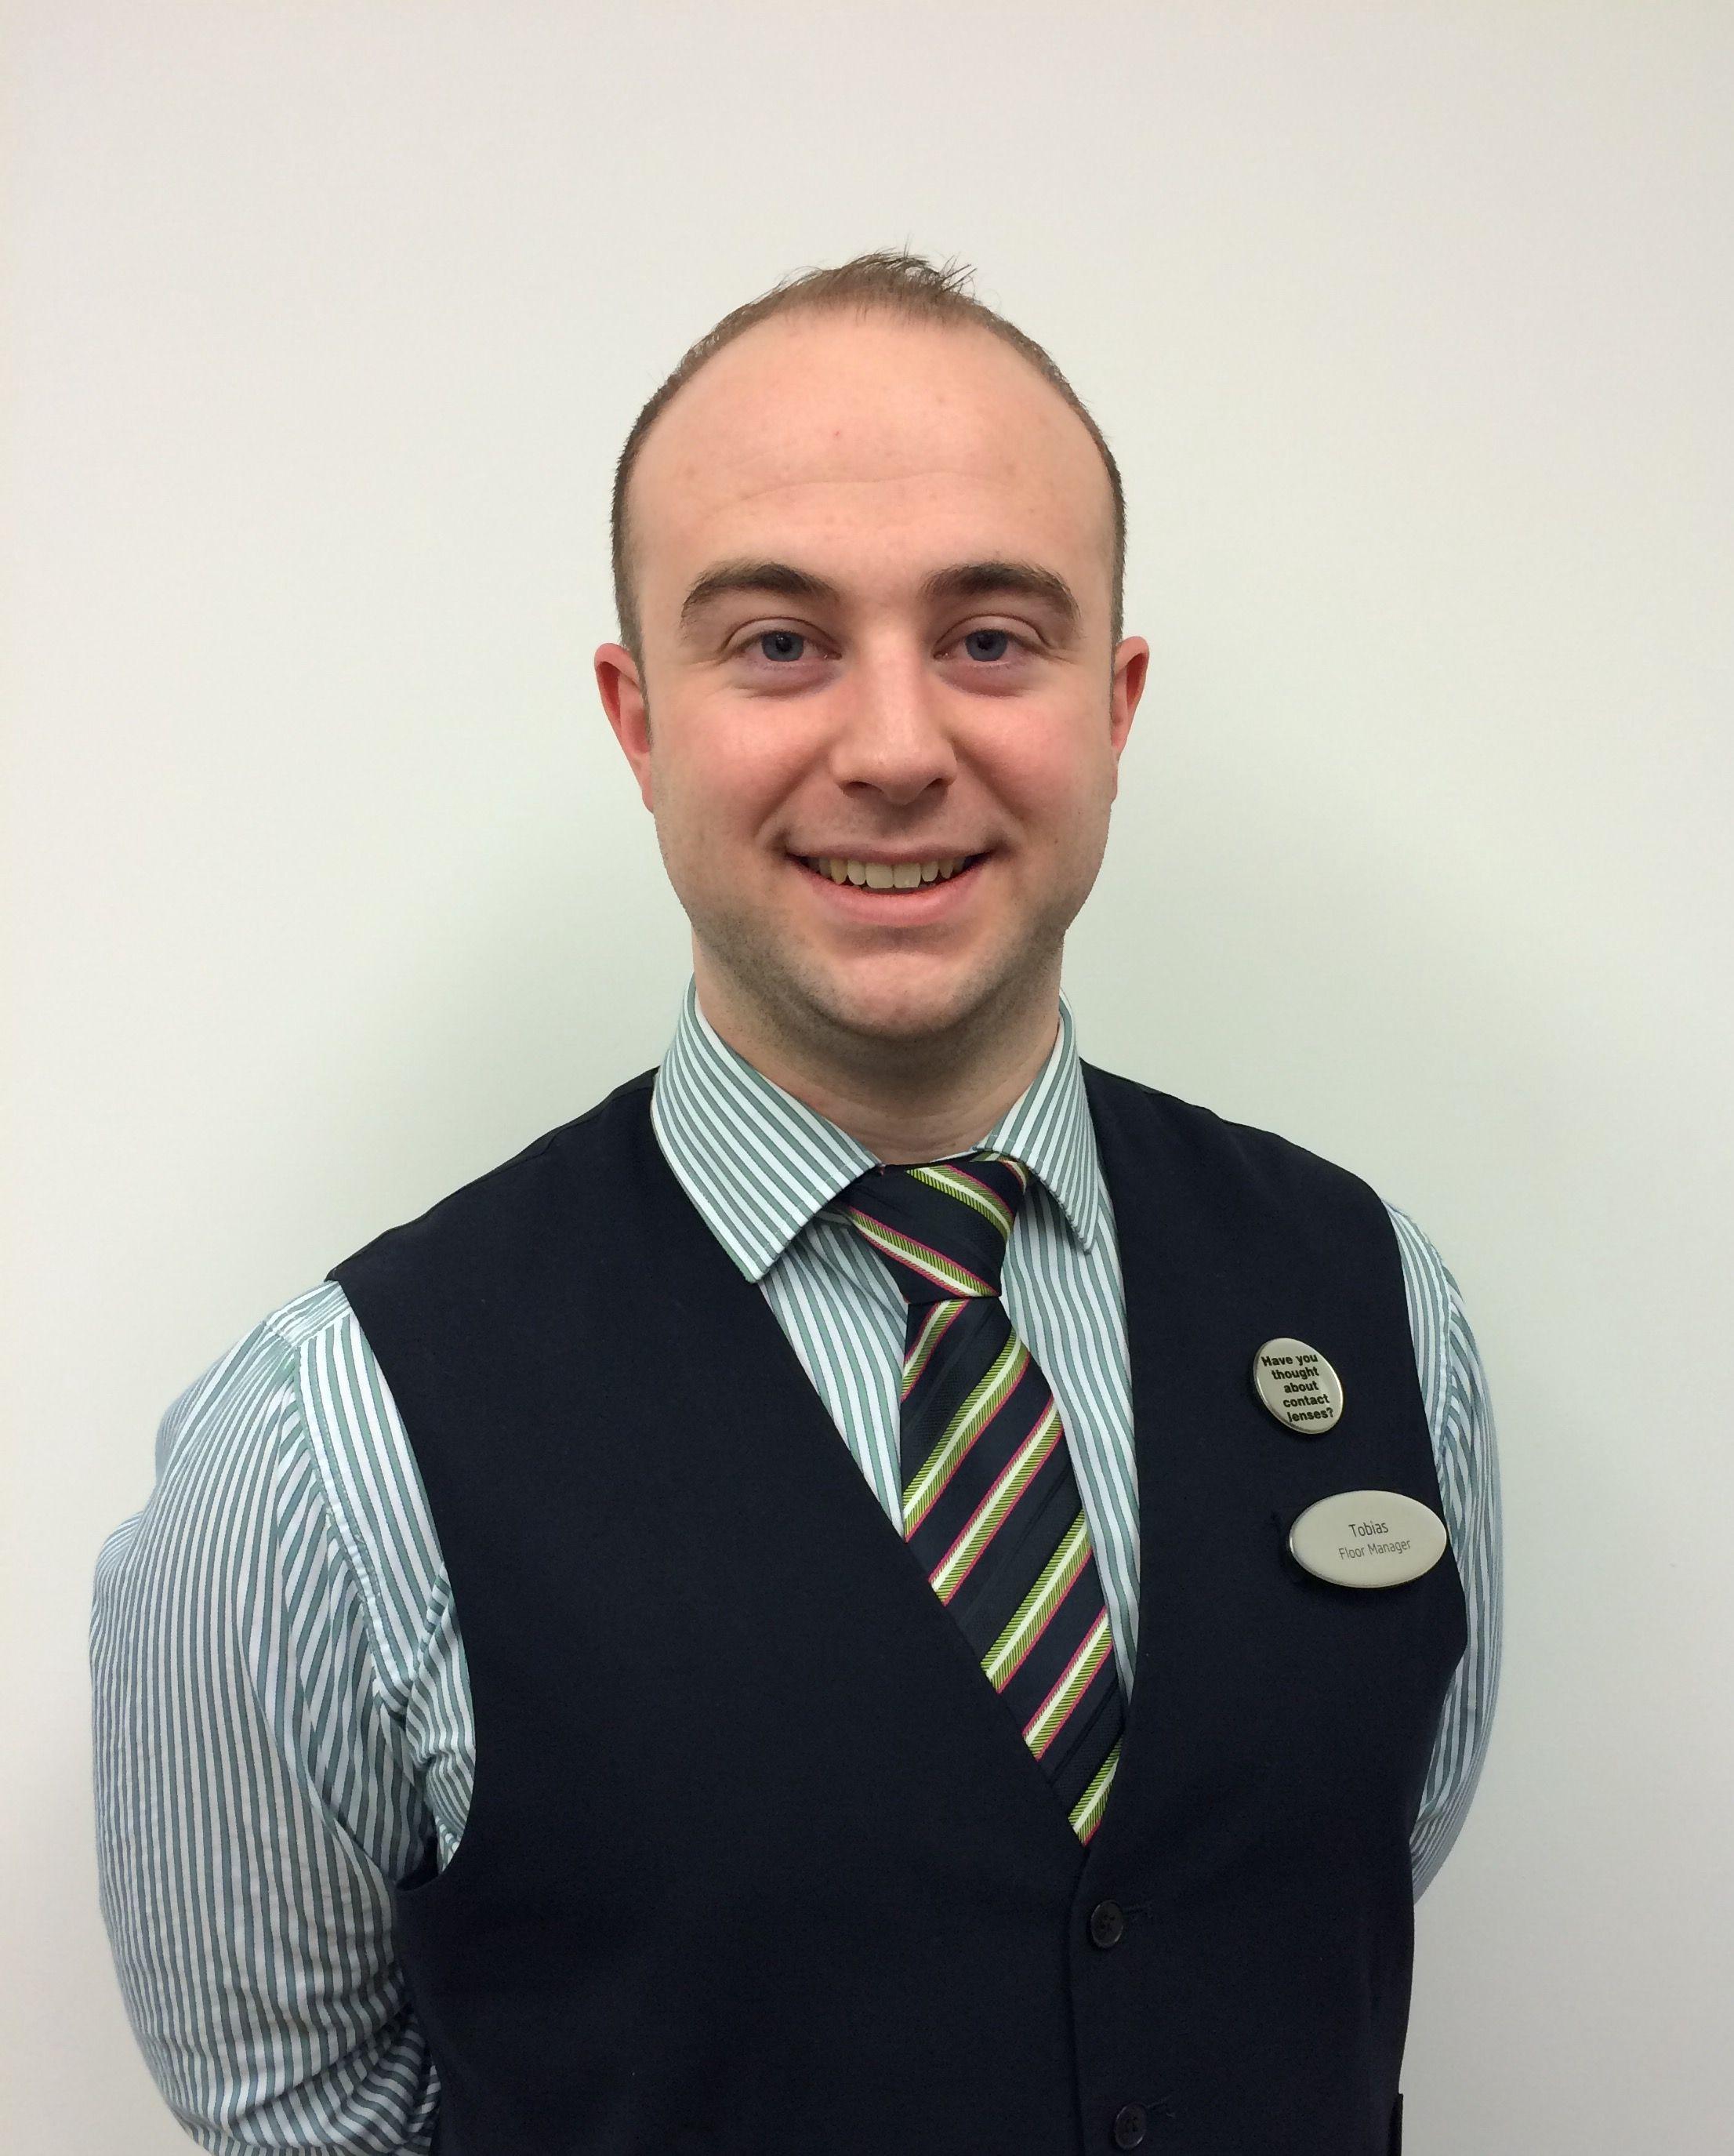 Tobias Craig-Brown, floor manager/dispensing optician at Specsavers Worthing